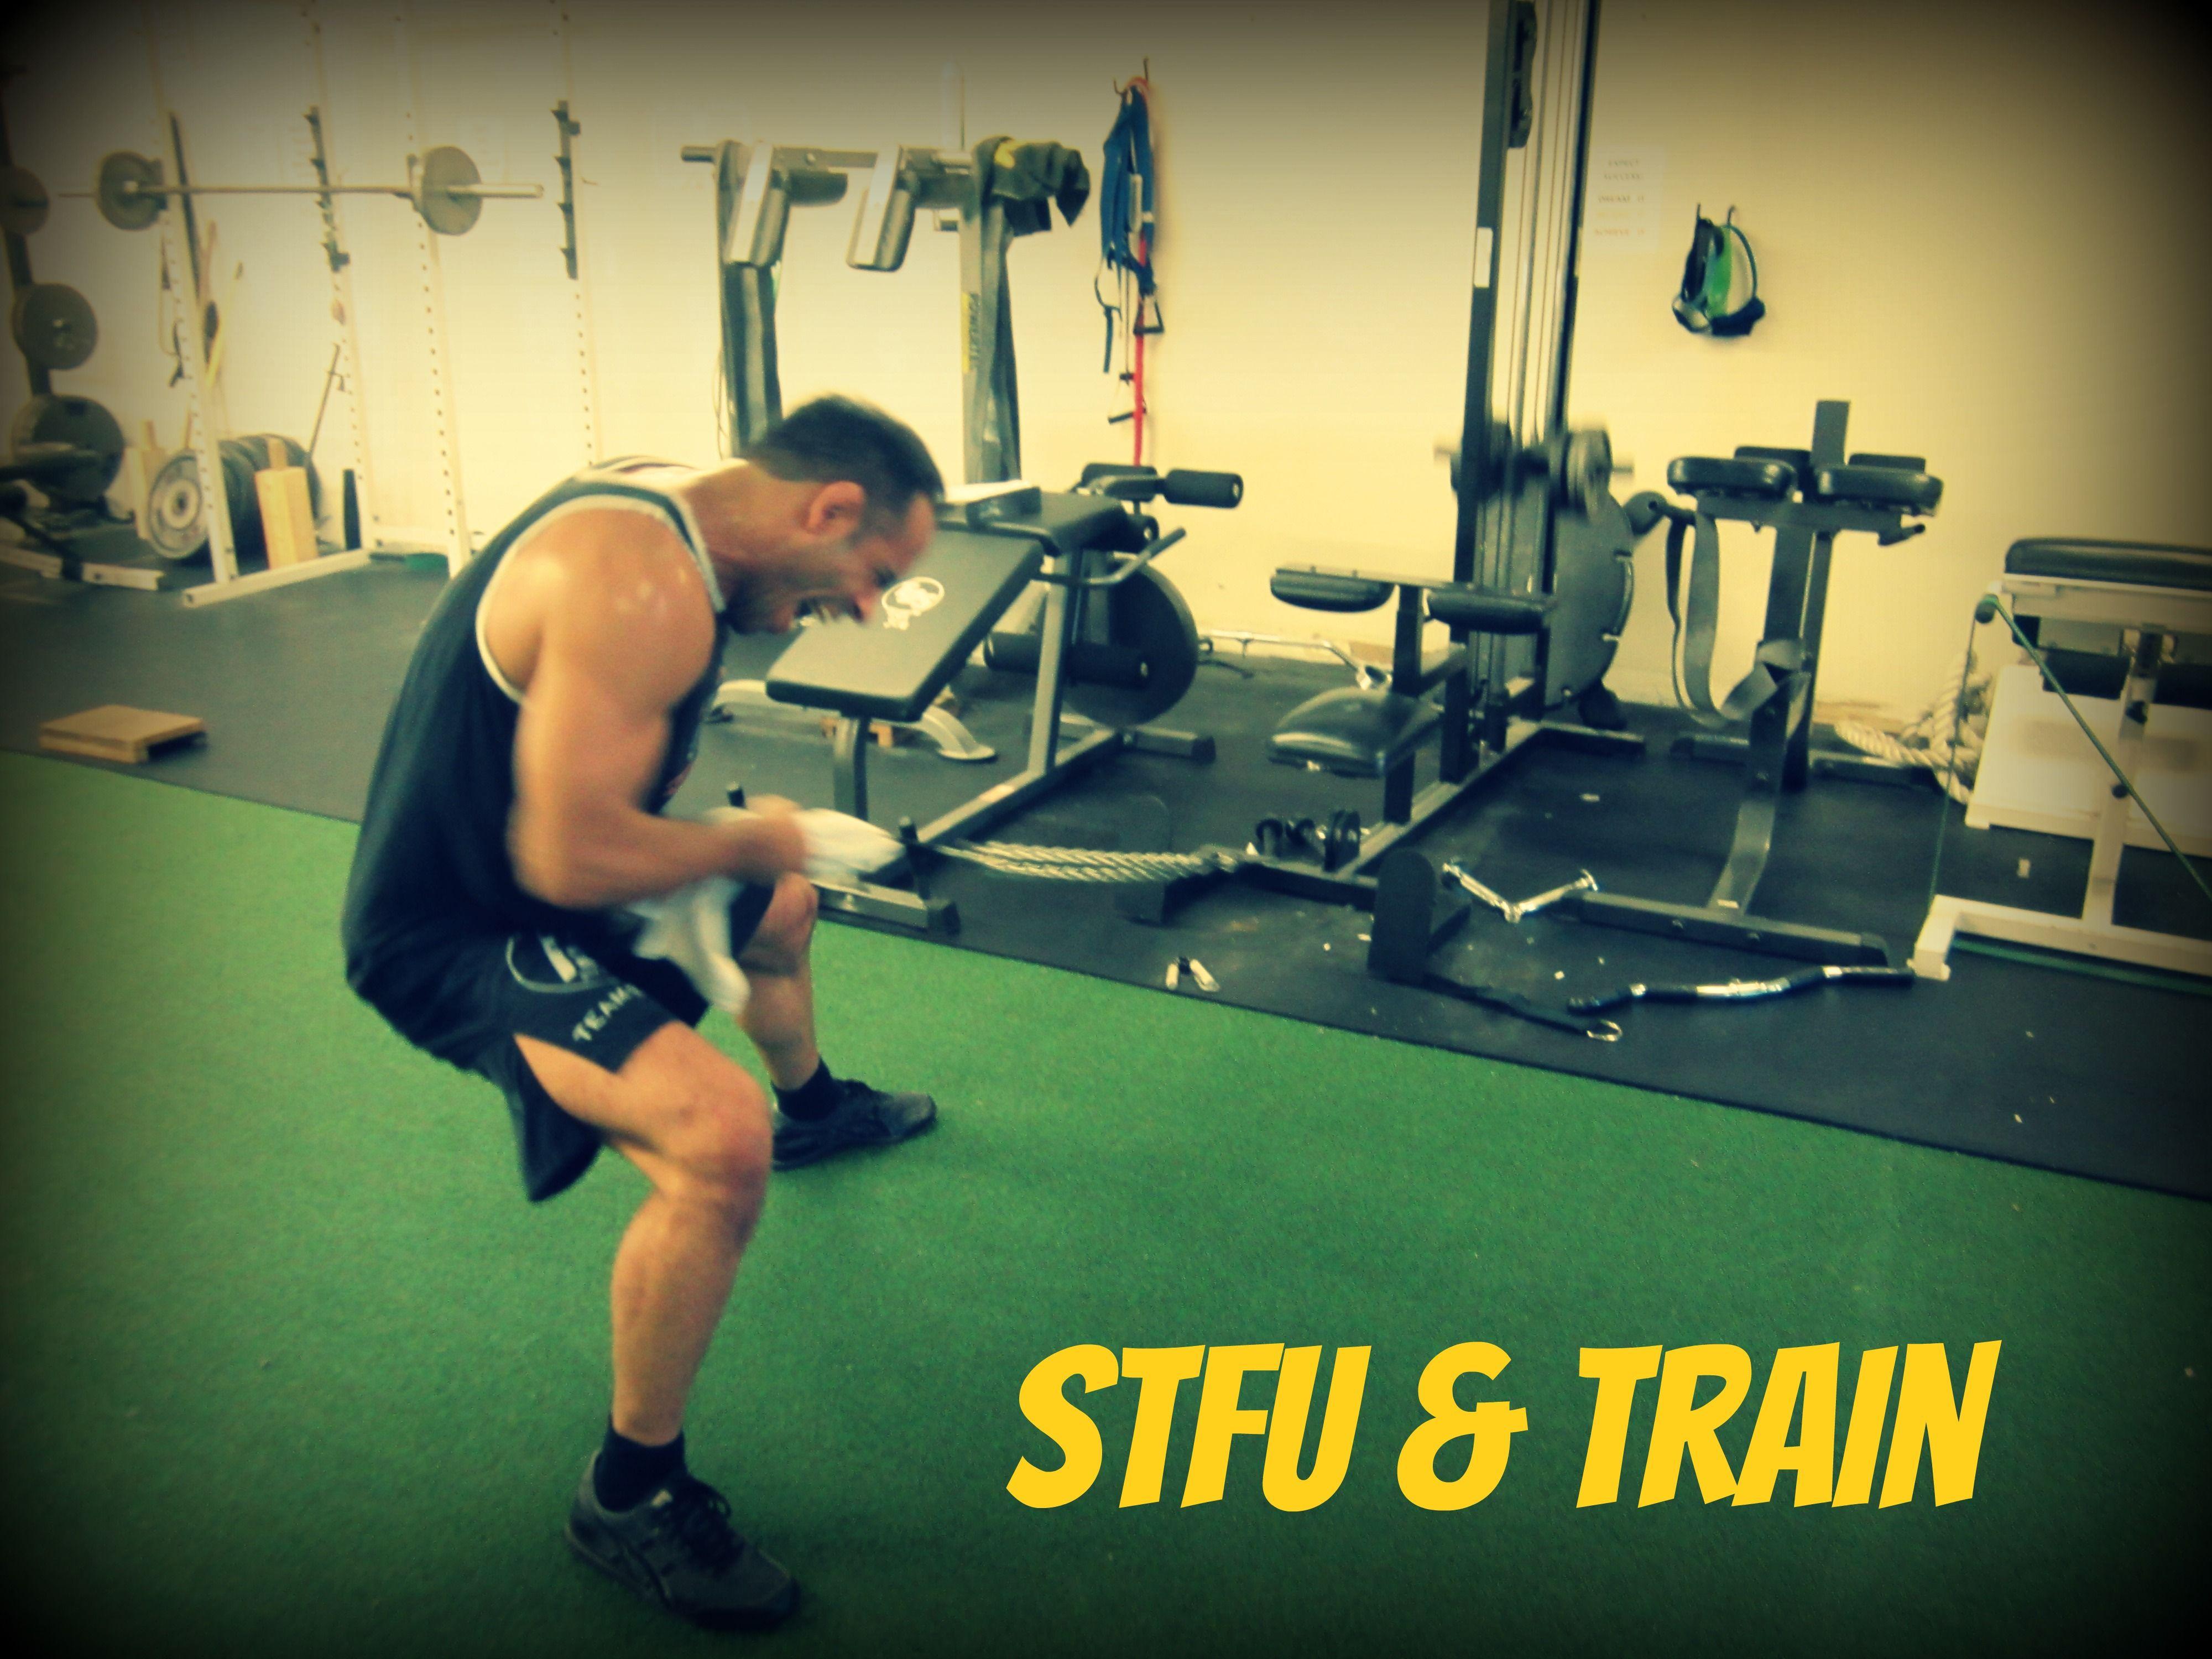 Www Ilovebjj Com Exercise Gym Train